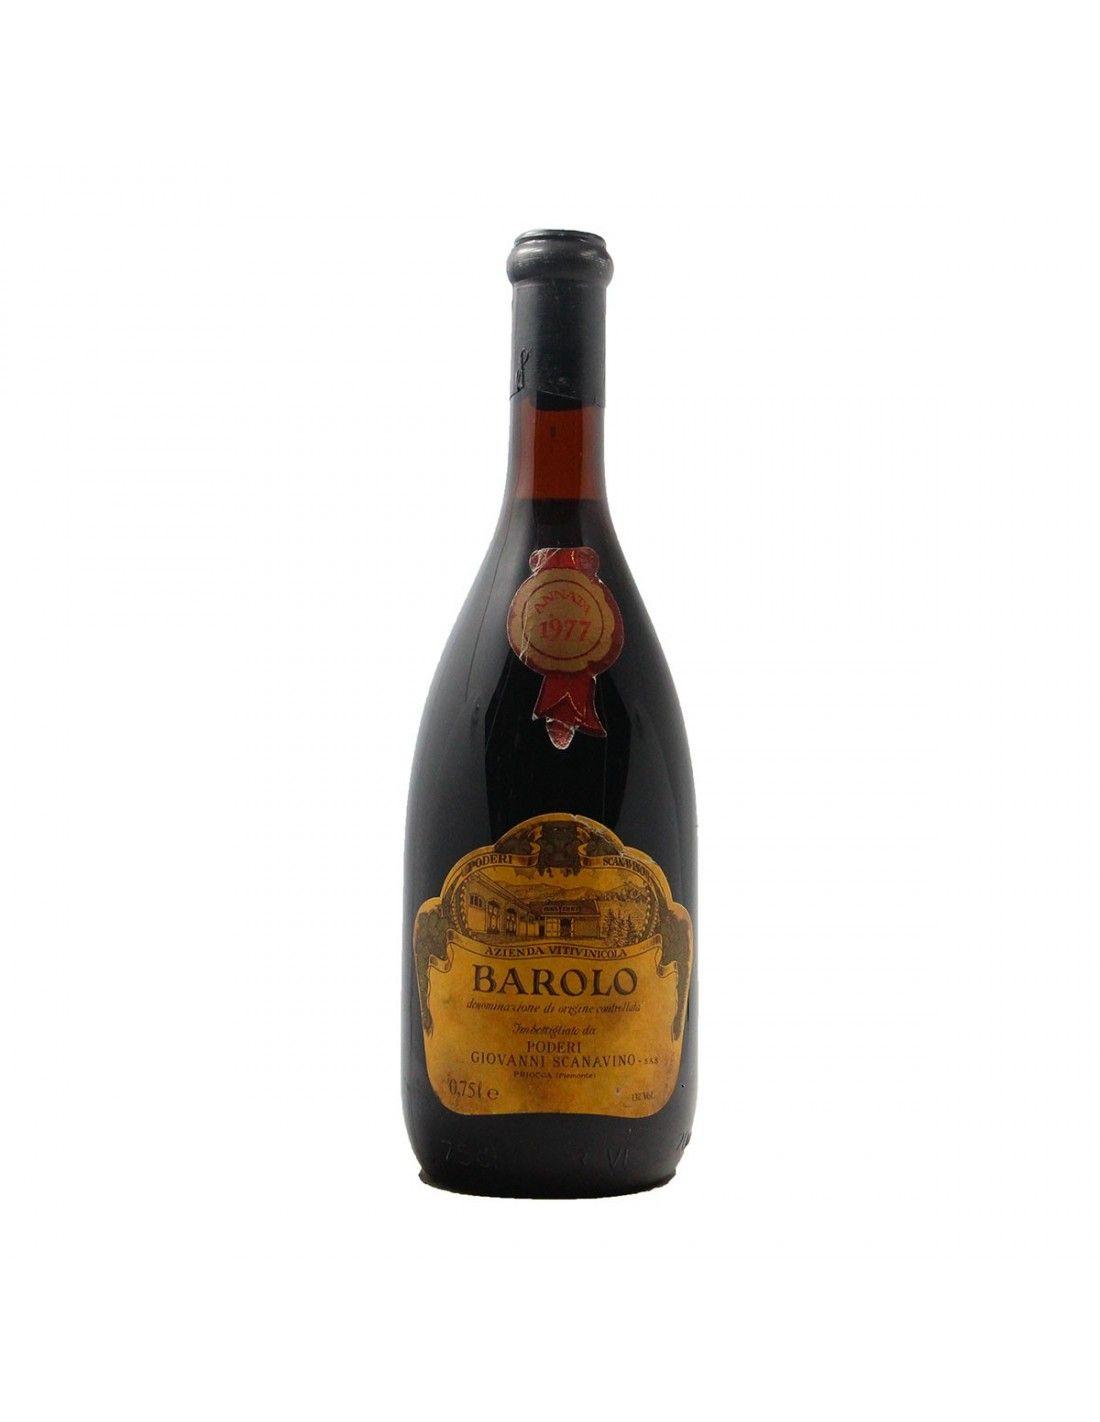 BAROLO 1977 SCANAVINO Grandi Bottiglie